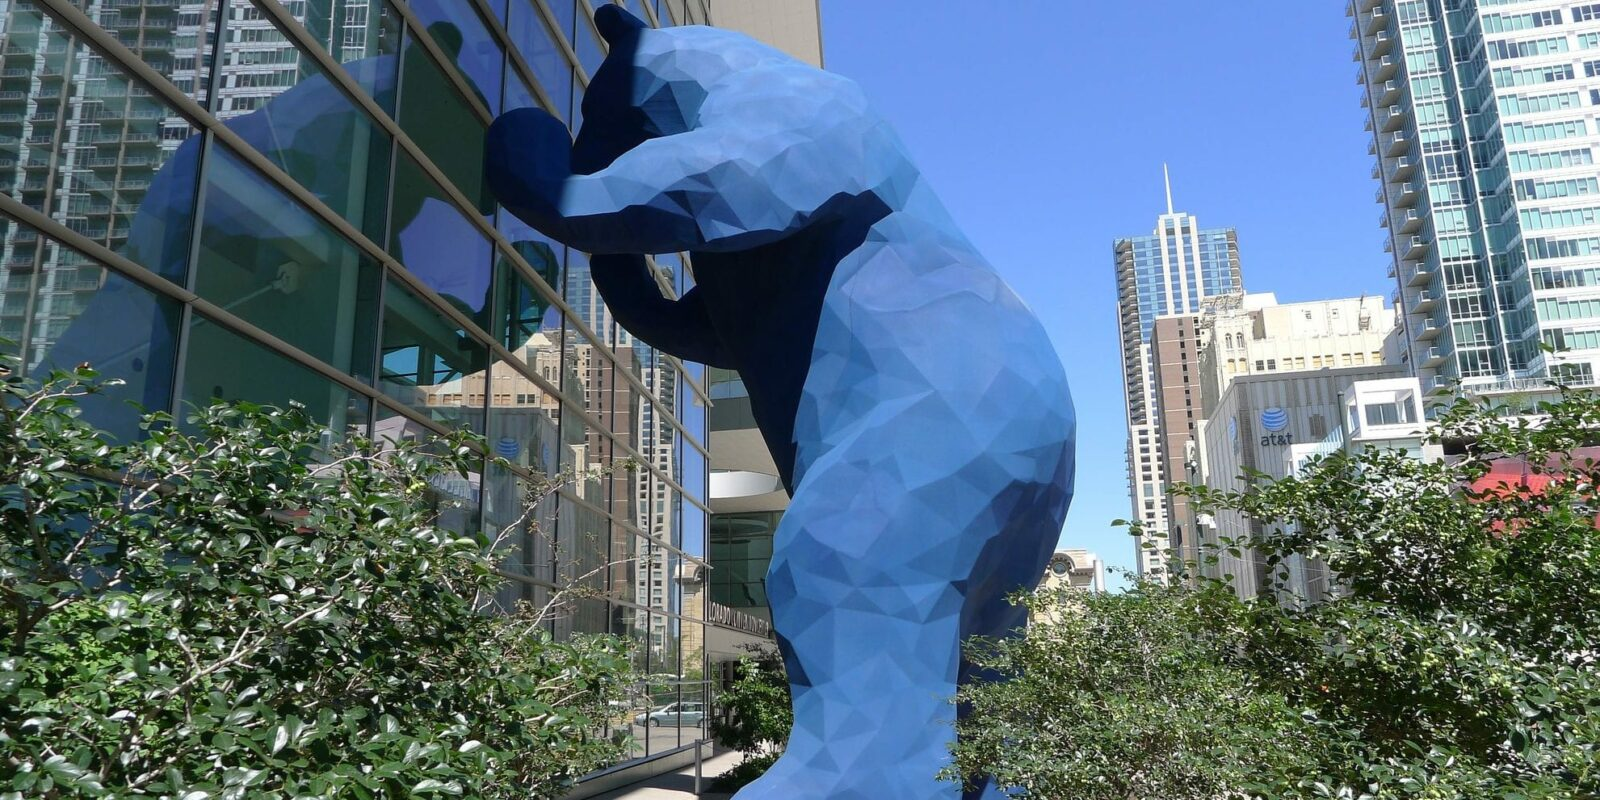 iamge of big blue bear